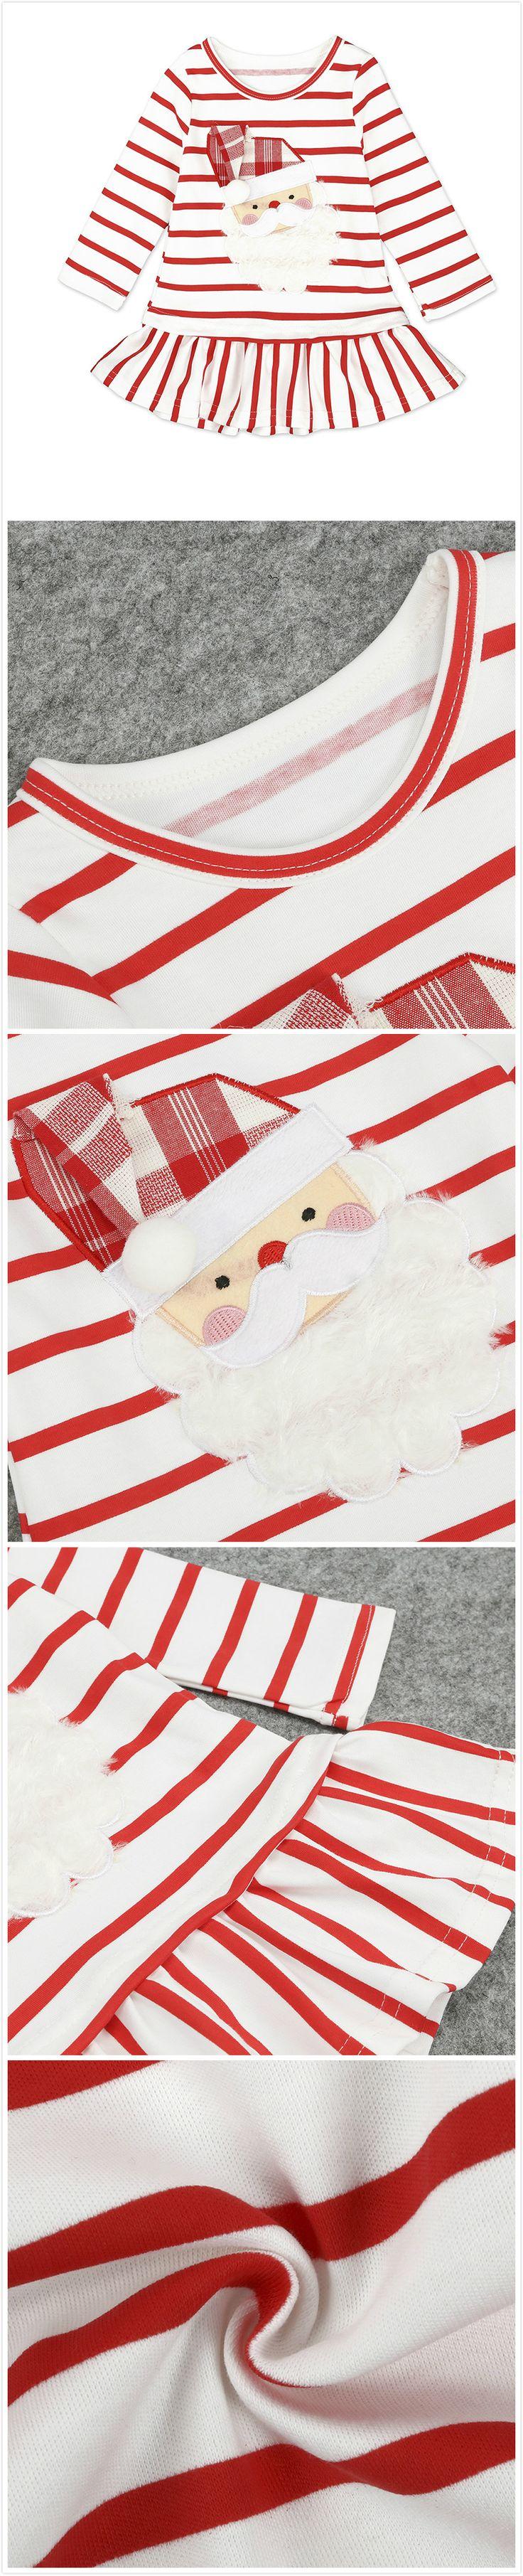 Baby Toddler's Girl Christmas Santa Dress